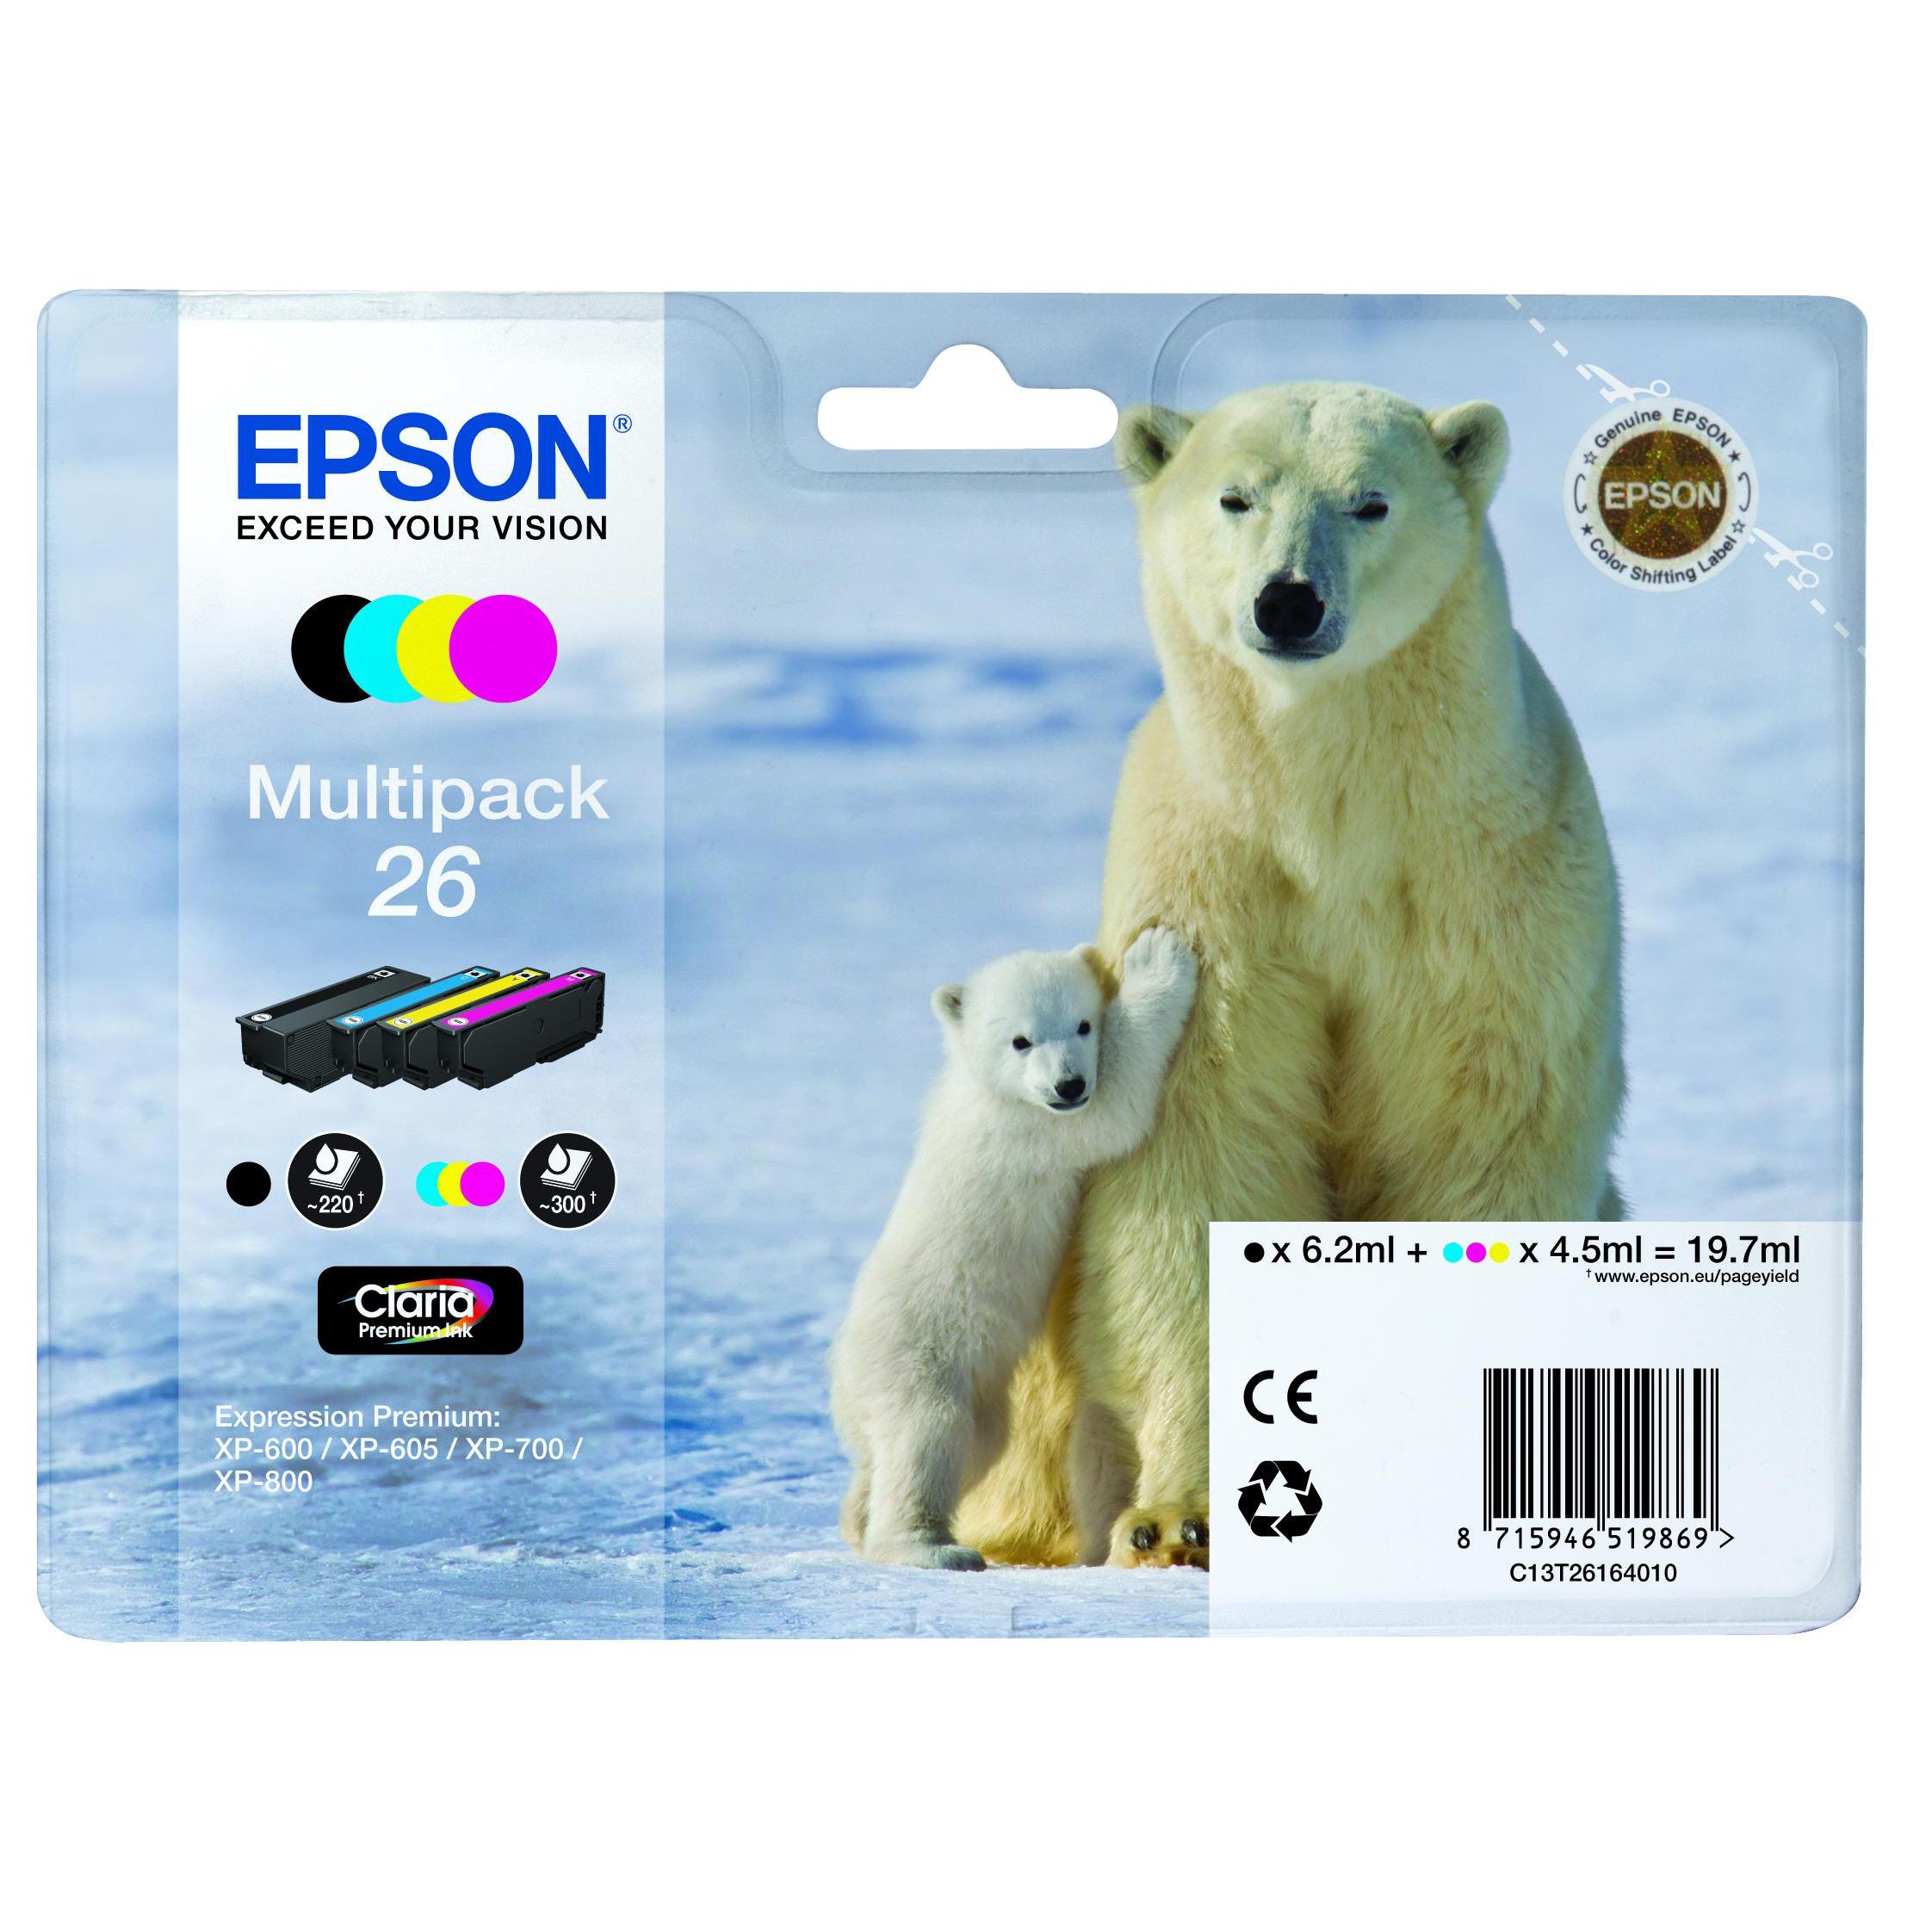 Epson 26 Inkjet Cartridge Polar Bear Black/Cyan/Magenta/Yellow 19.7ml Ref C13T26164010 Pack 4